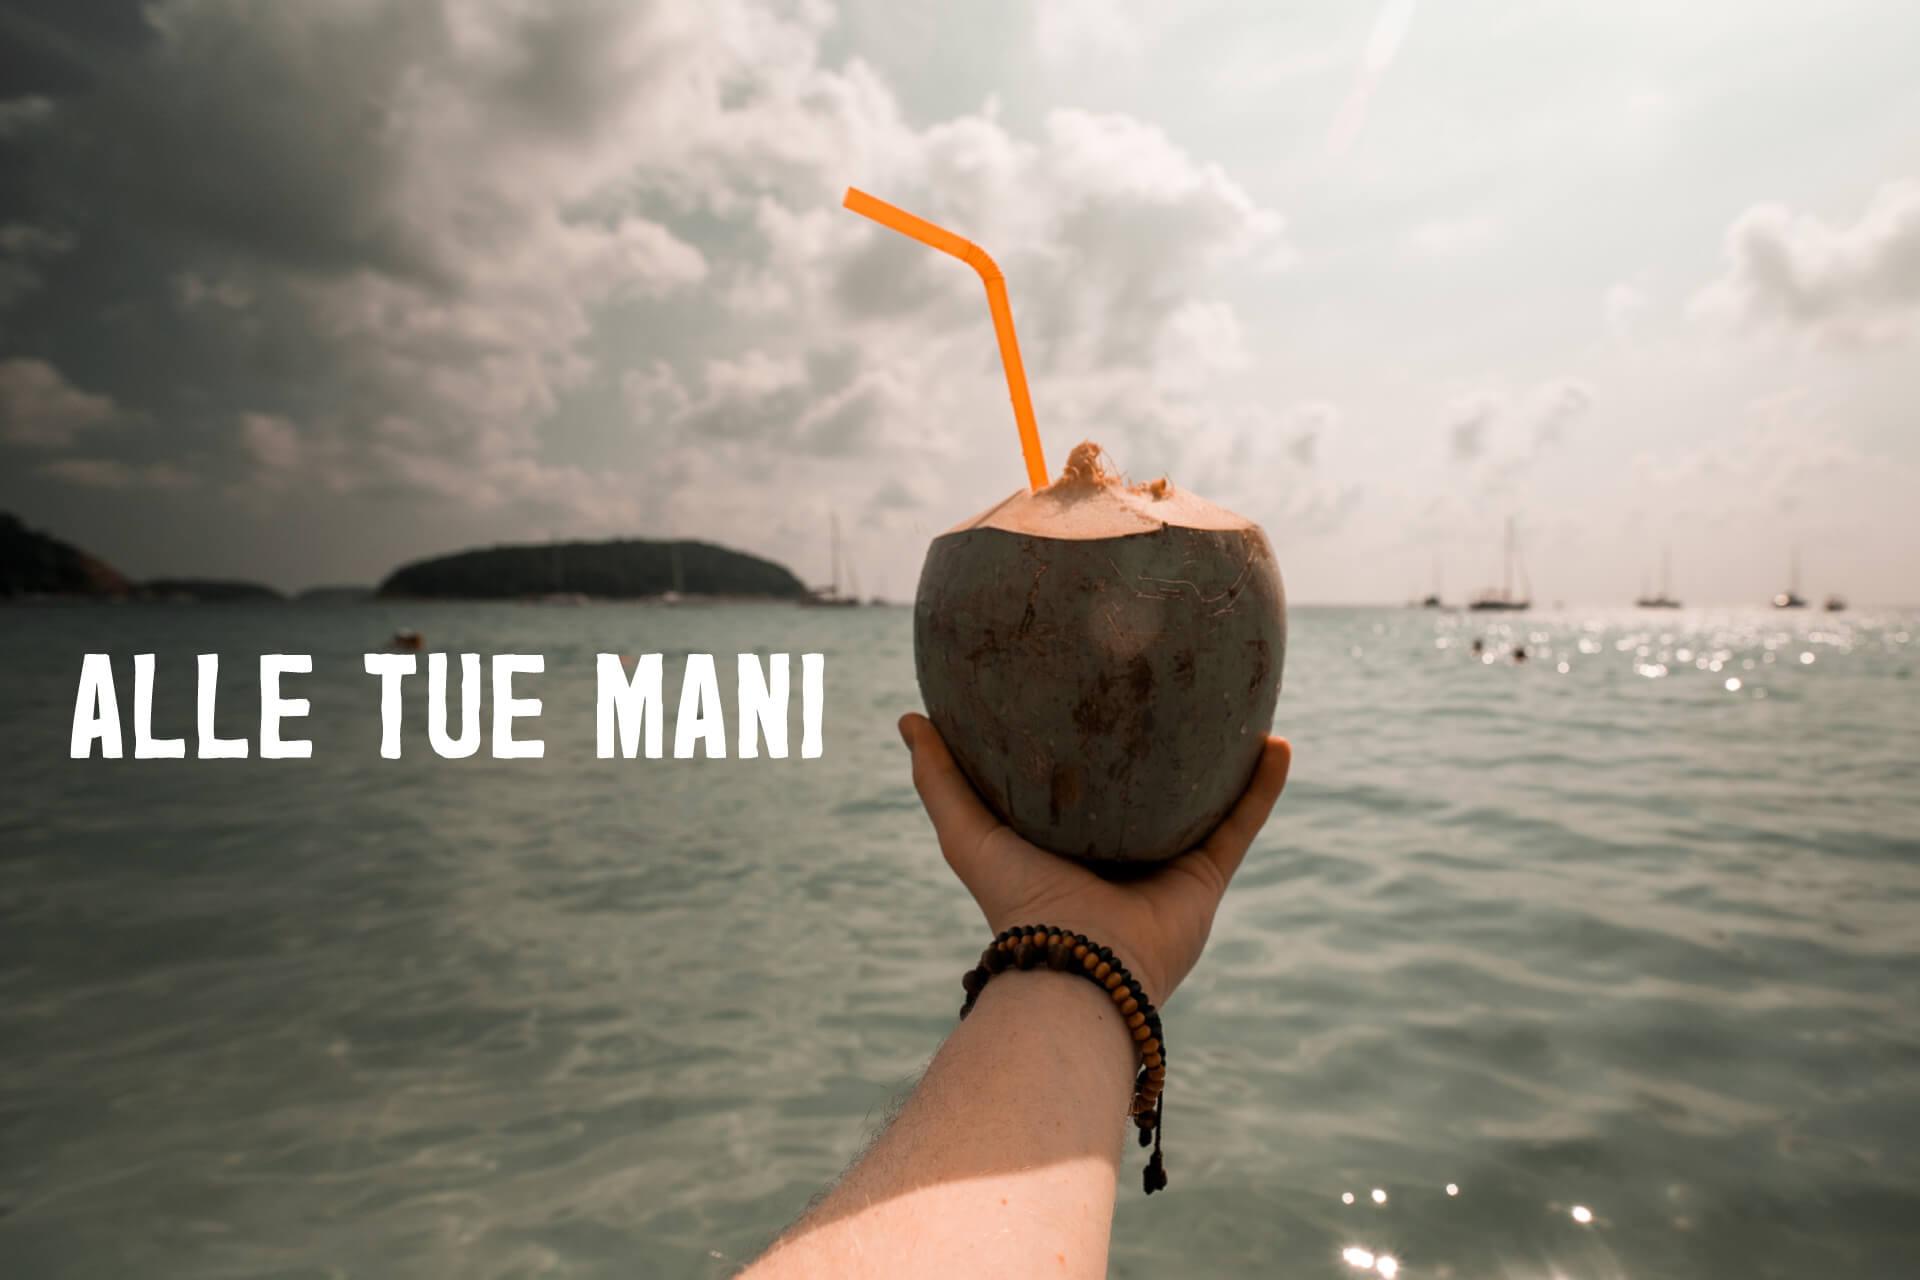 Uomo in barca tiene cocco verde con cannuccia arancione